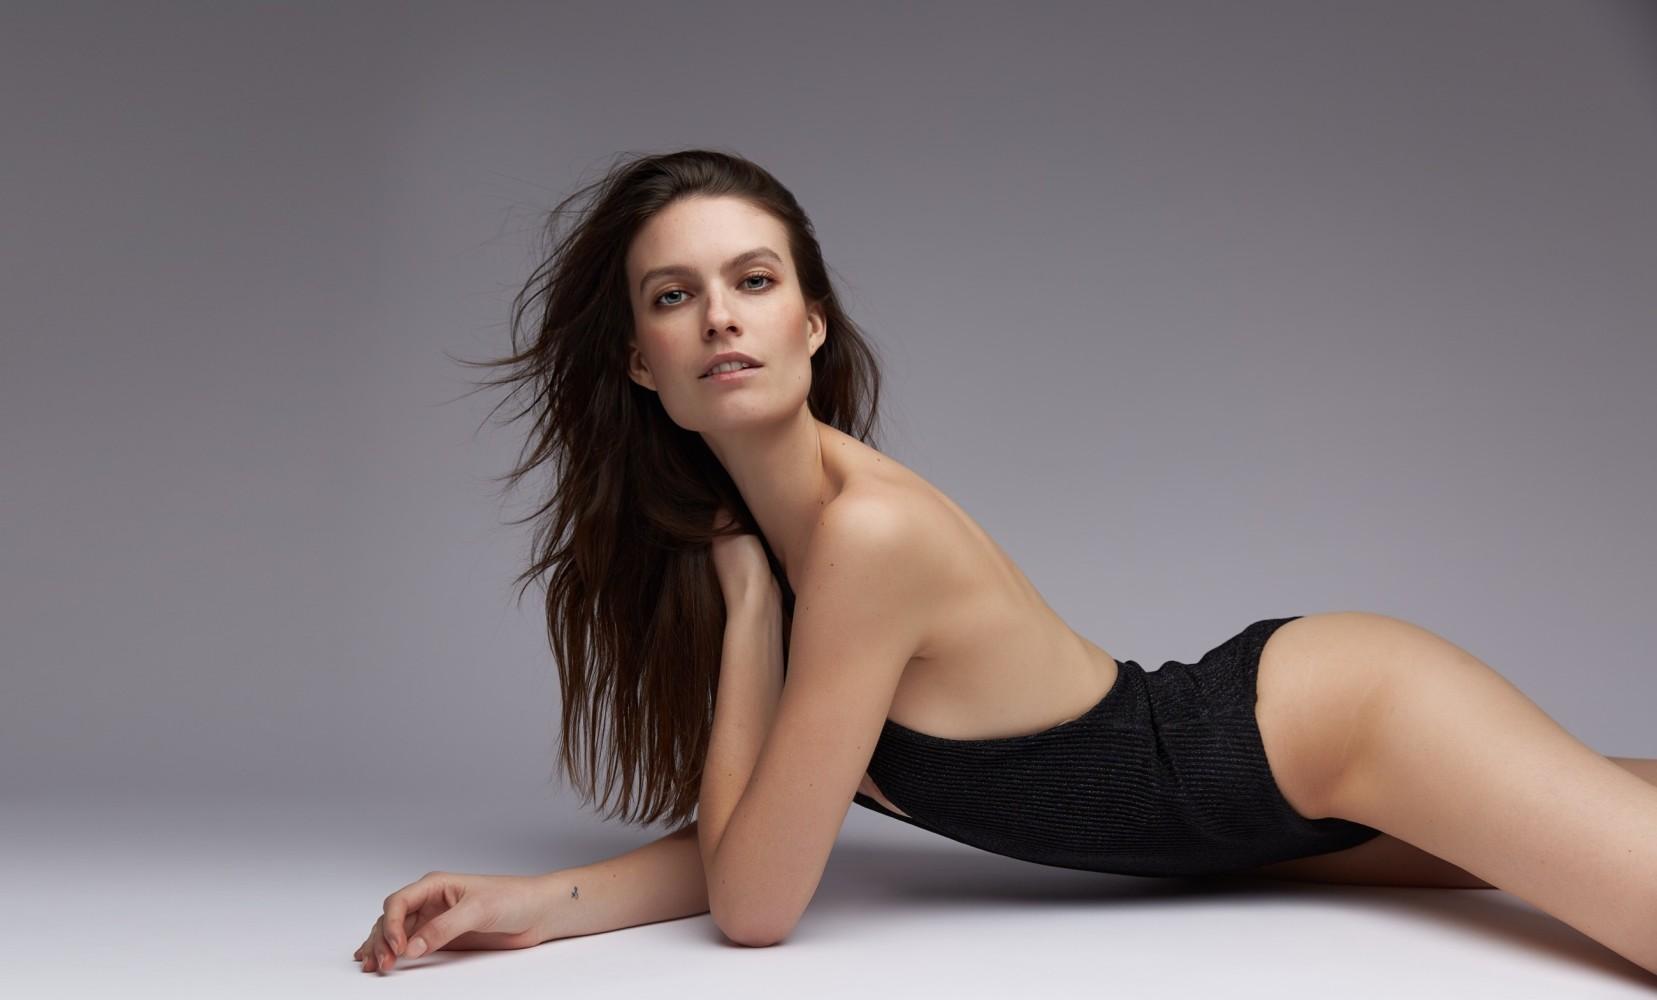 Johanna Nault